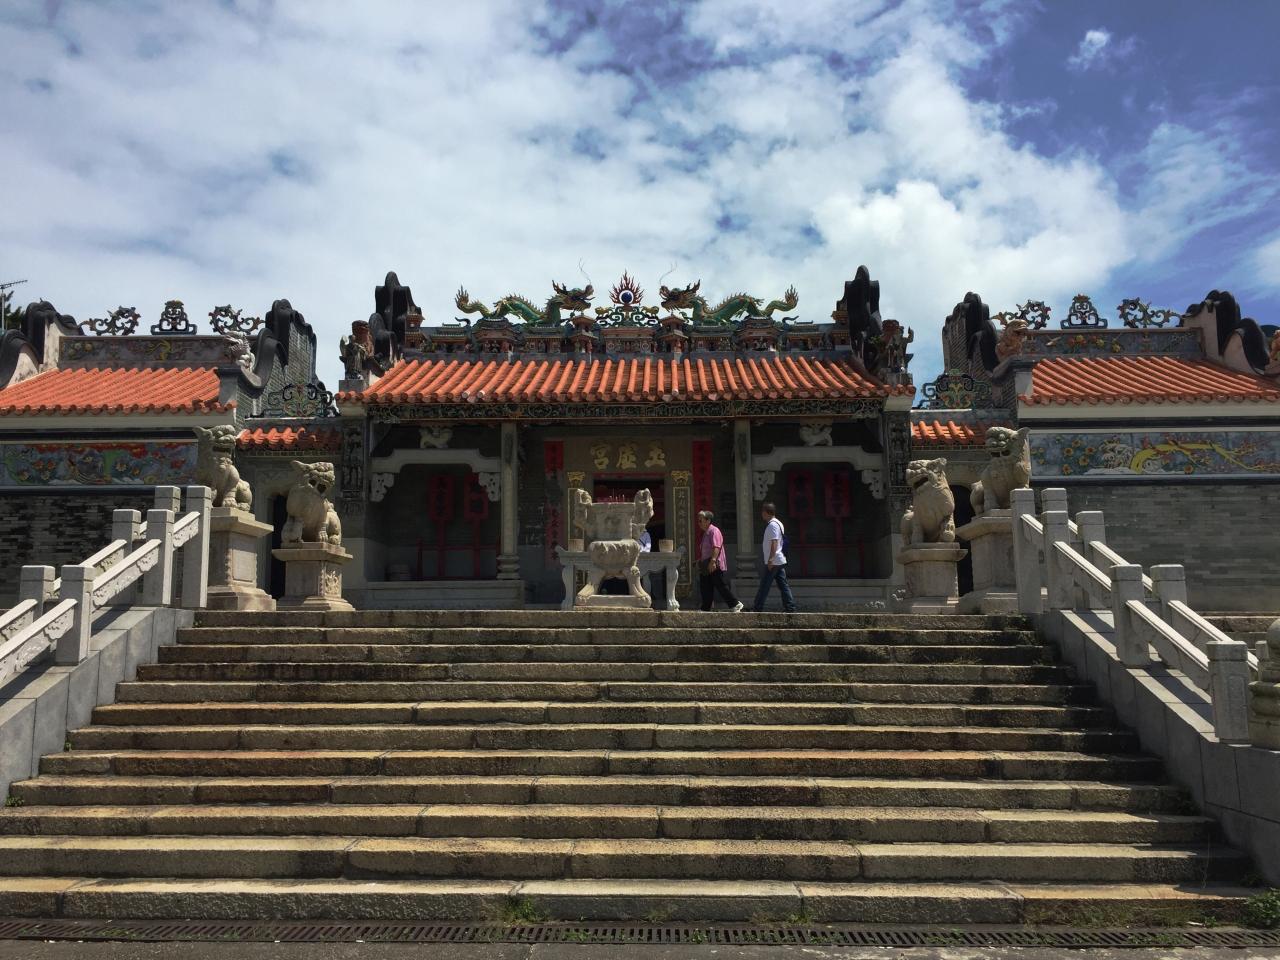 香港 #AlreadyTomorrowInHongKong- Adventuring without a blue box-TARDIS   Cheung Chau- Yuk Hui Temple... Photographer @KevinJamesNg 2016